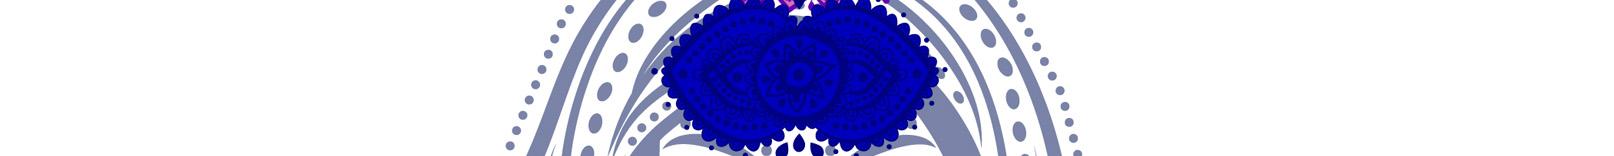 Chakra 6 Azul oscuro